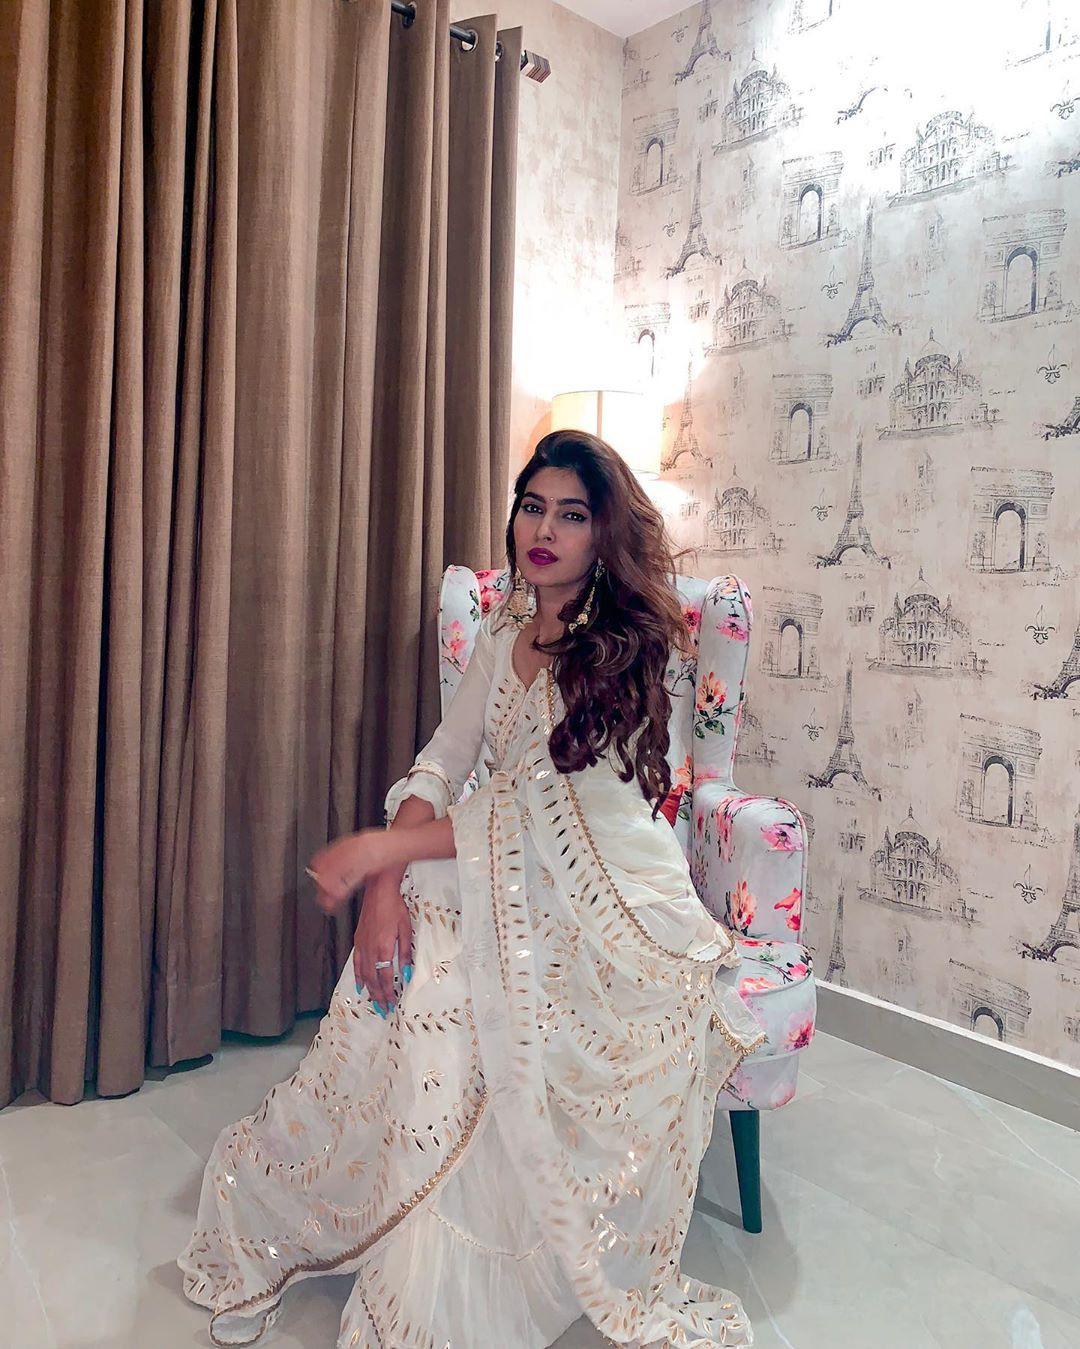 Karishma Sharma Instagram Pictures, Karishma Sharma, Wedding dress